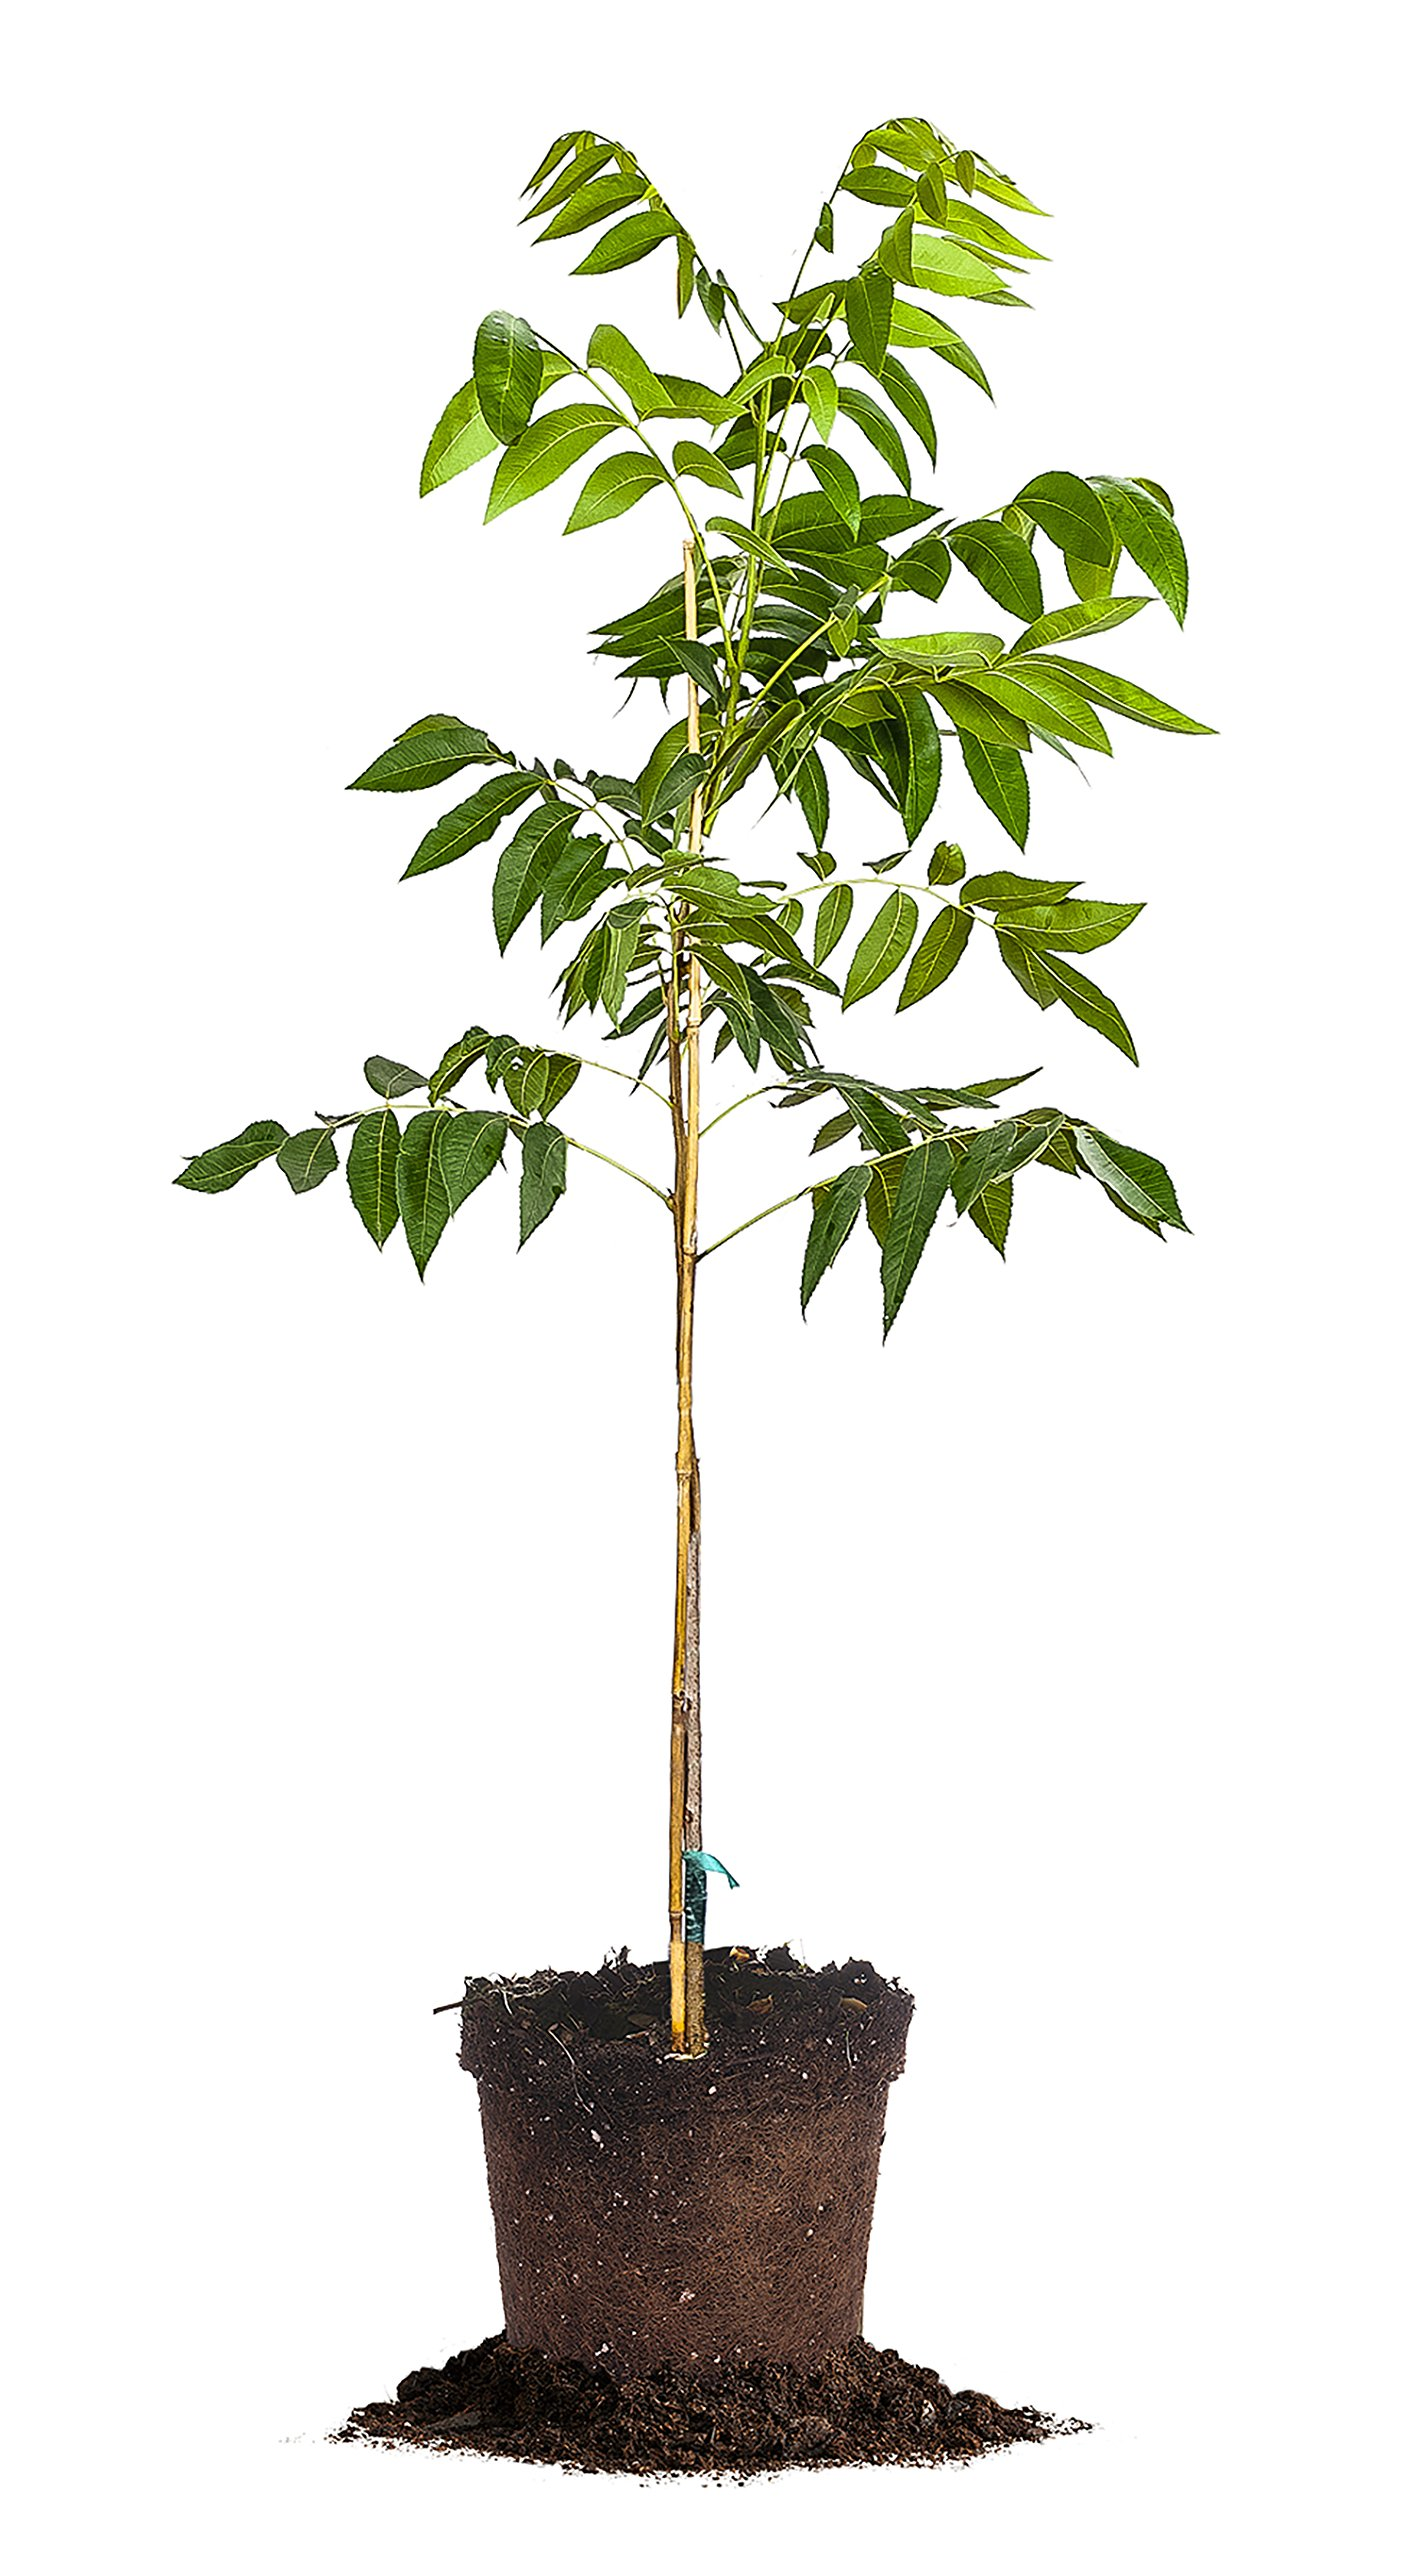 AMLING PECAN TREE - Size: 5 Gallon, live plant, includes special blend fertilizer & planting guide